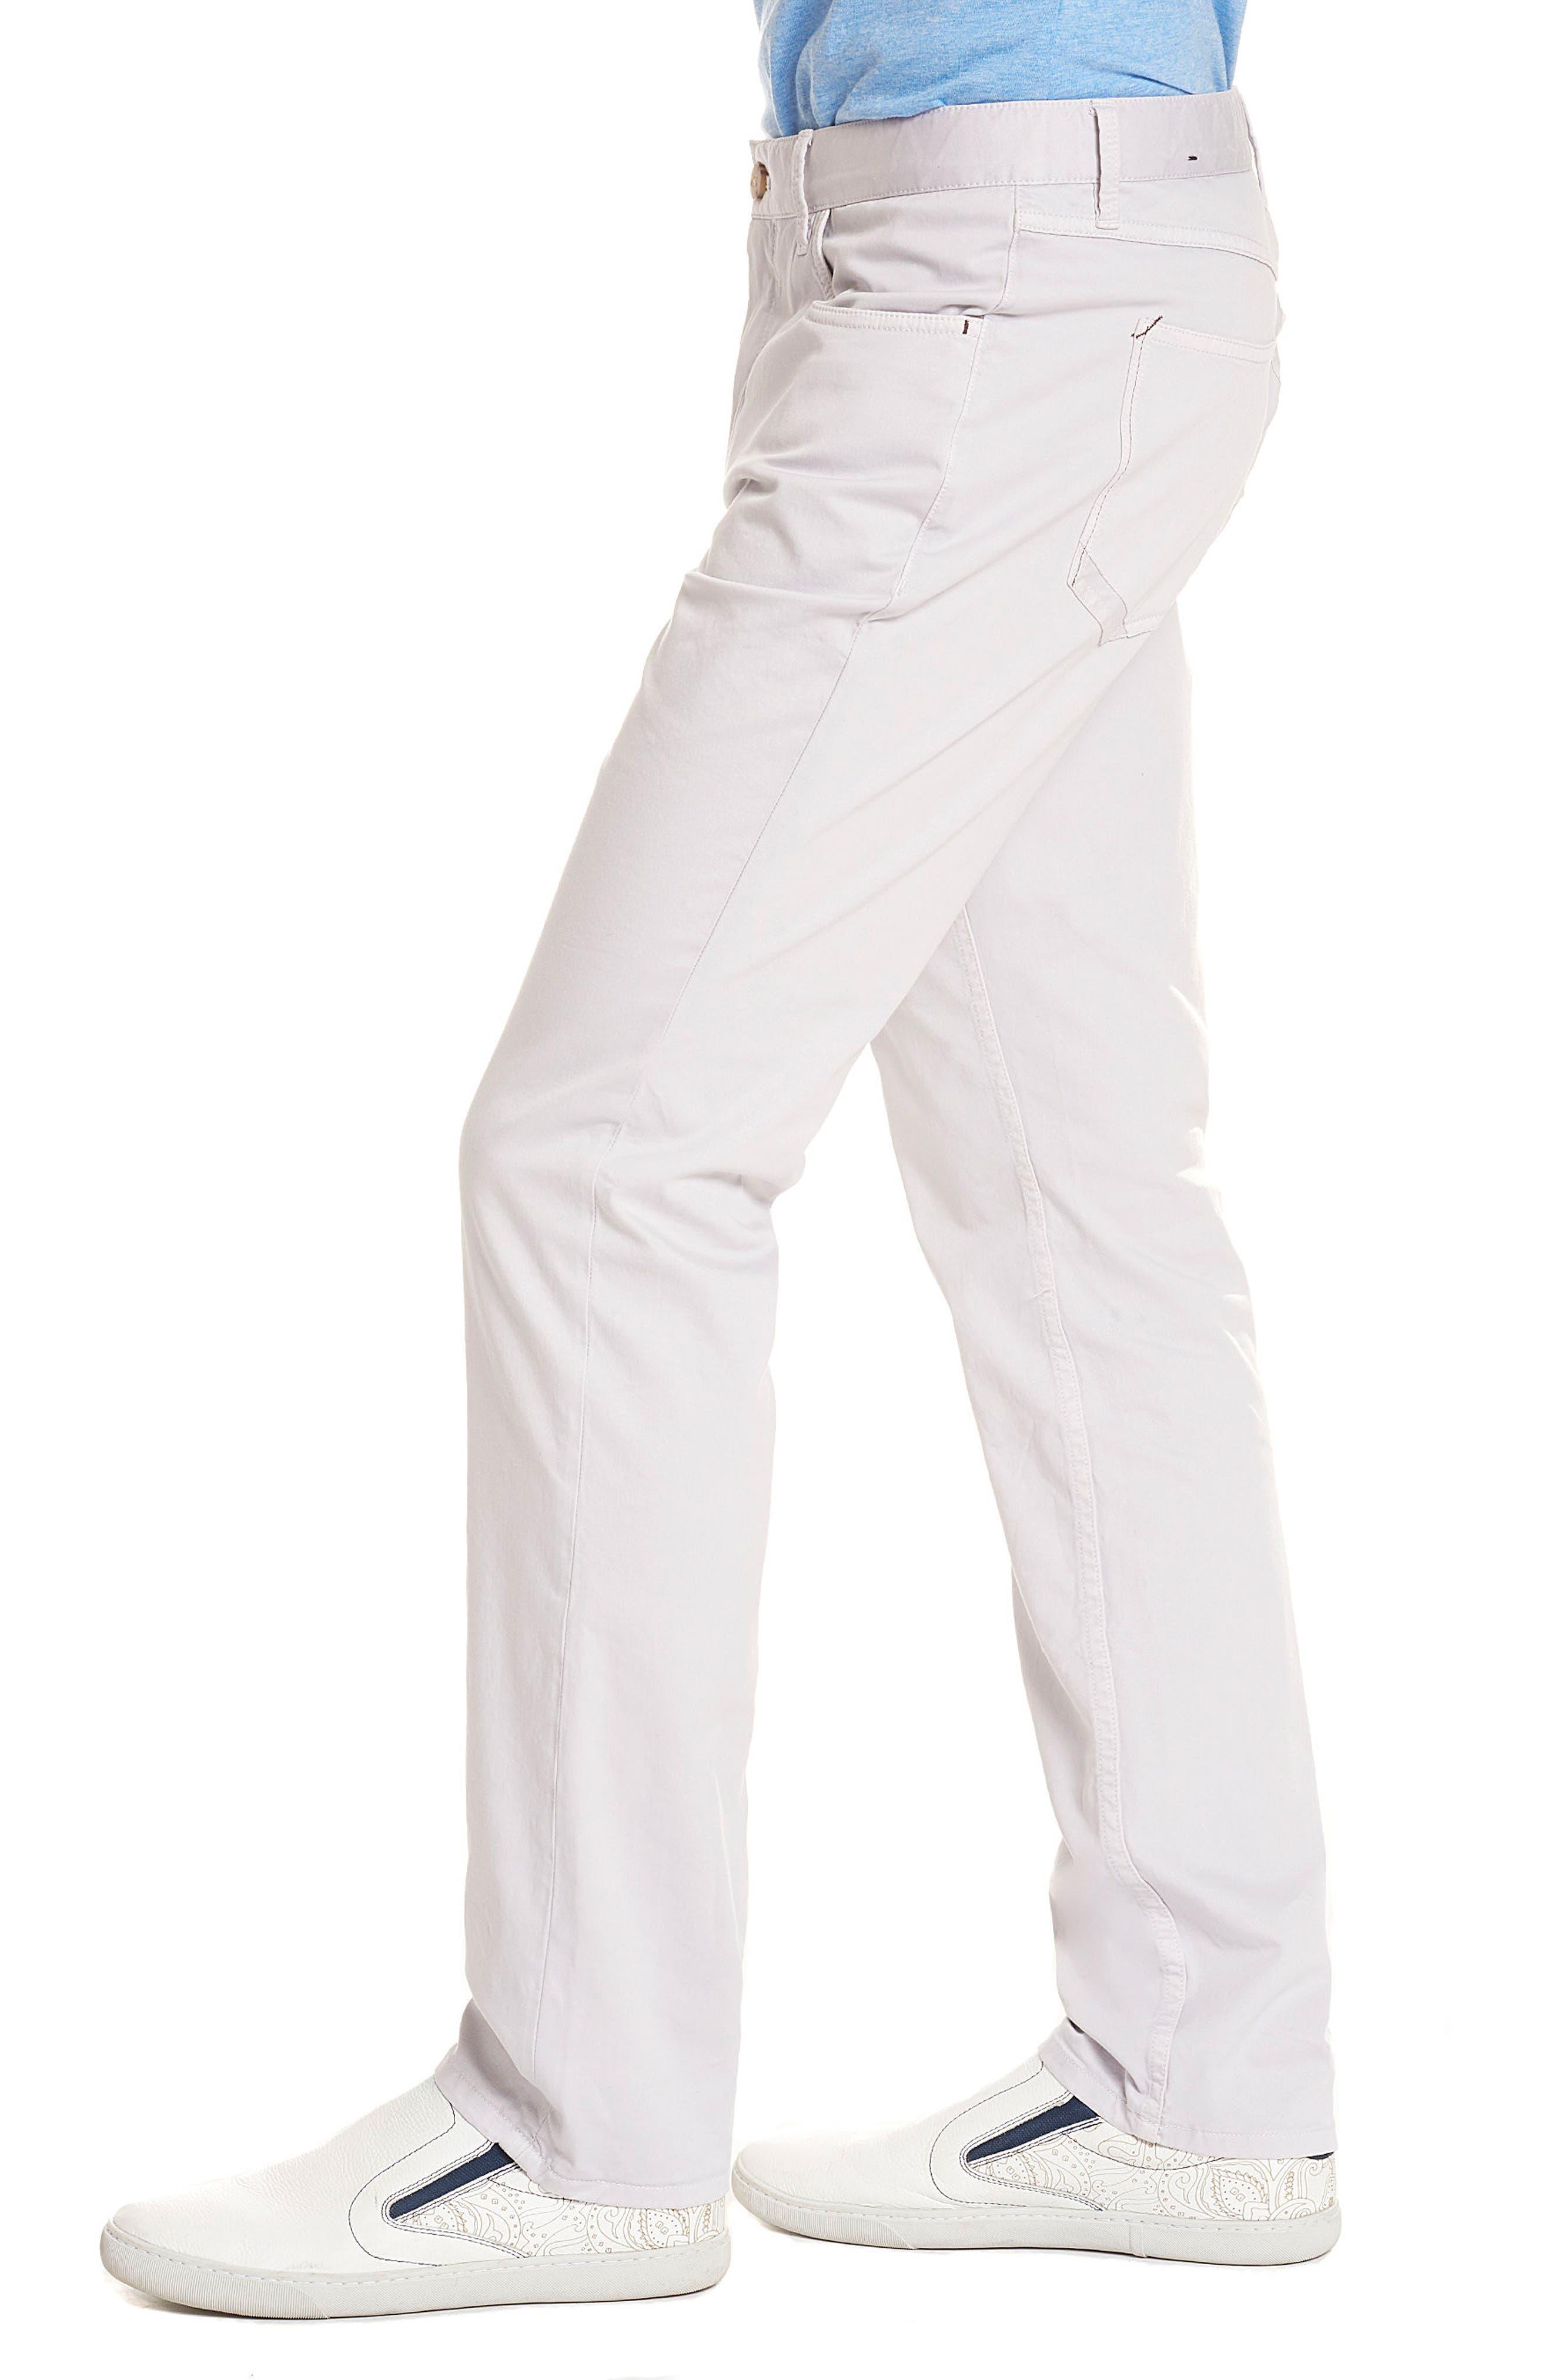 Marti Tailored Fit Pants,                             Alternate thumbnail 3, color,                             059